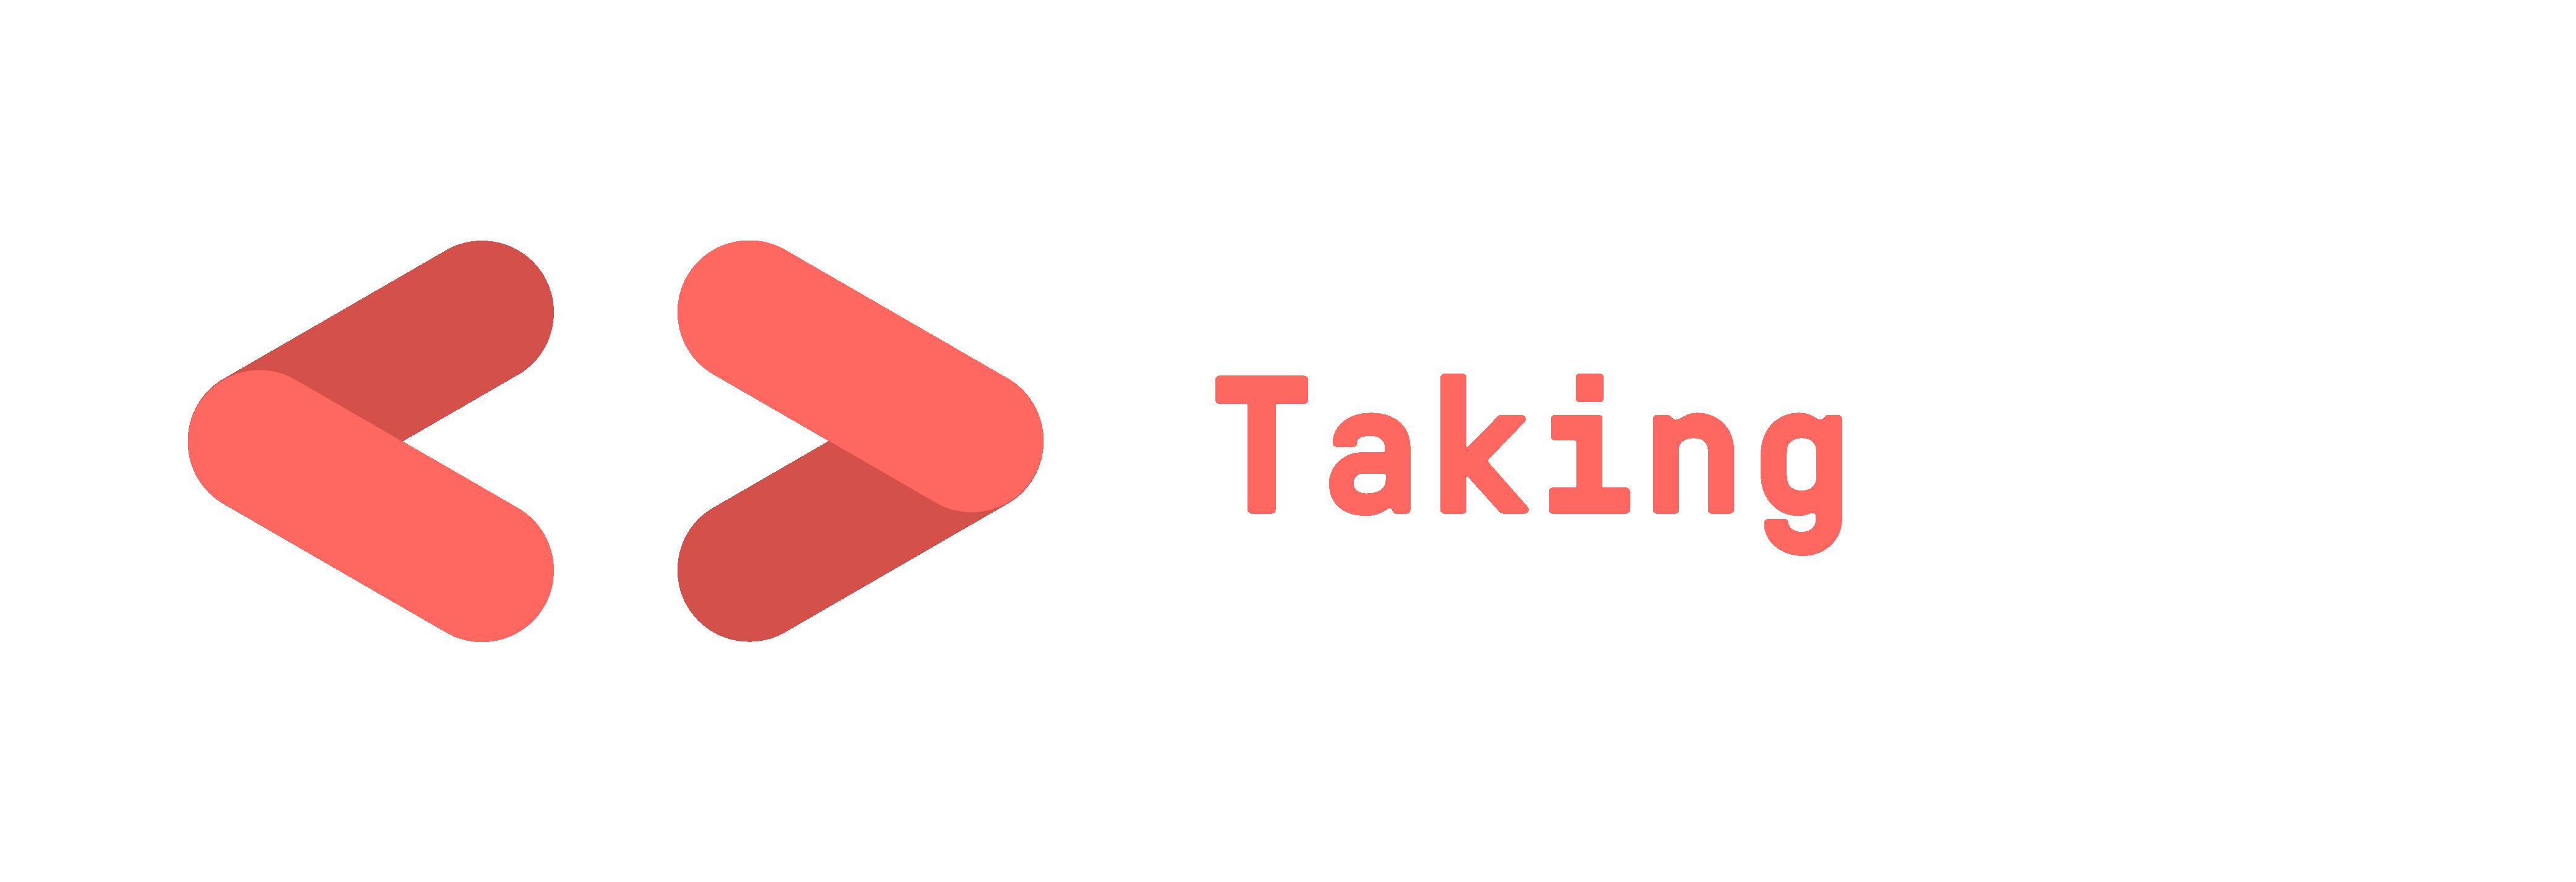 TakingCTRL